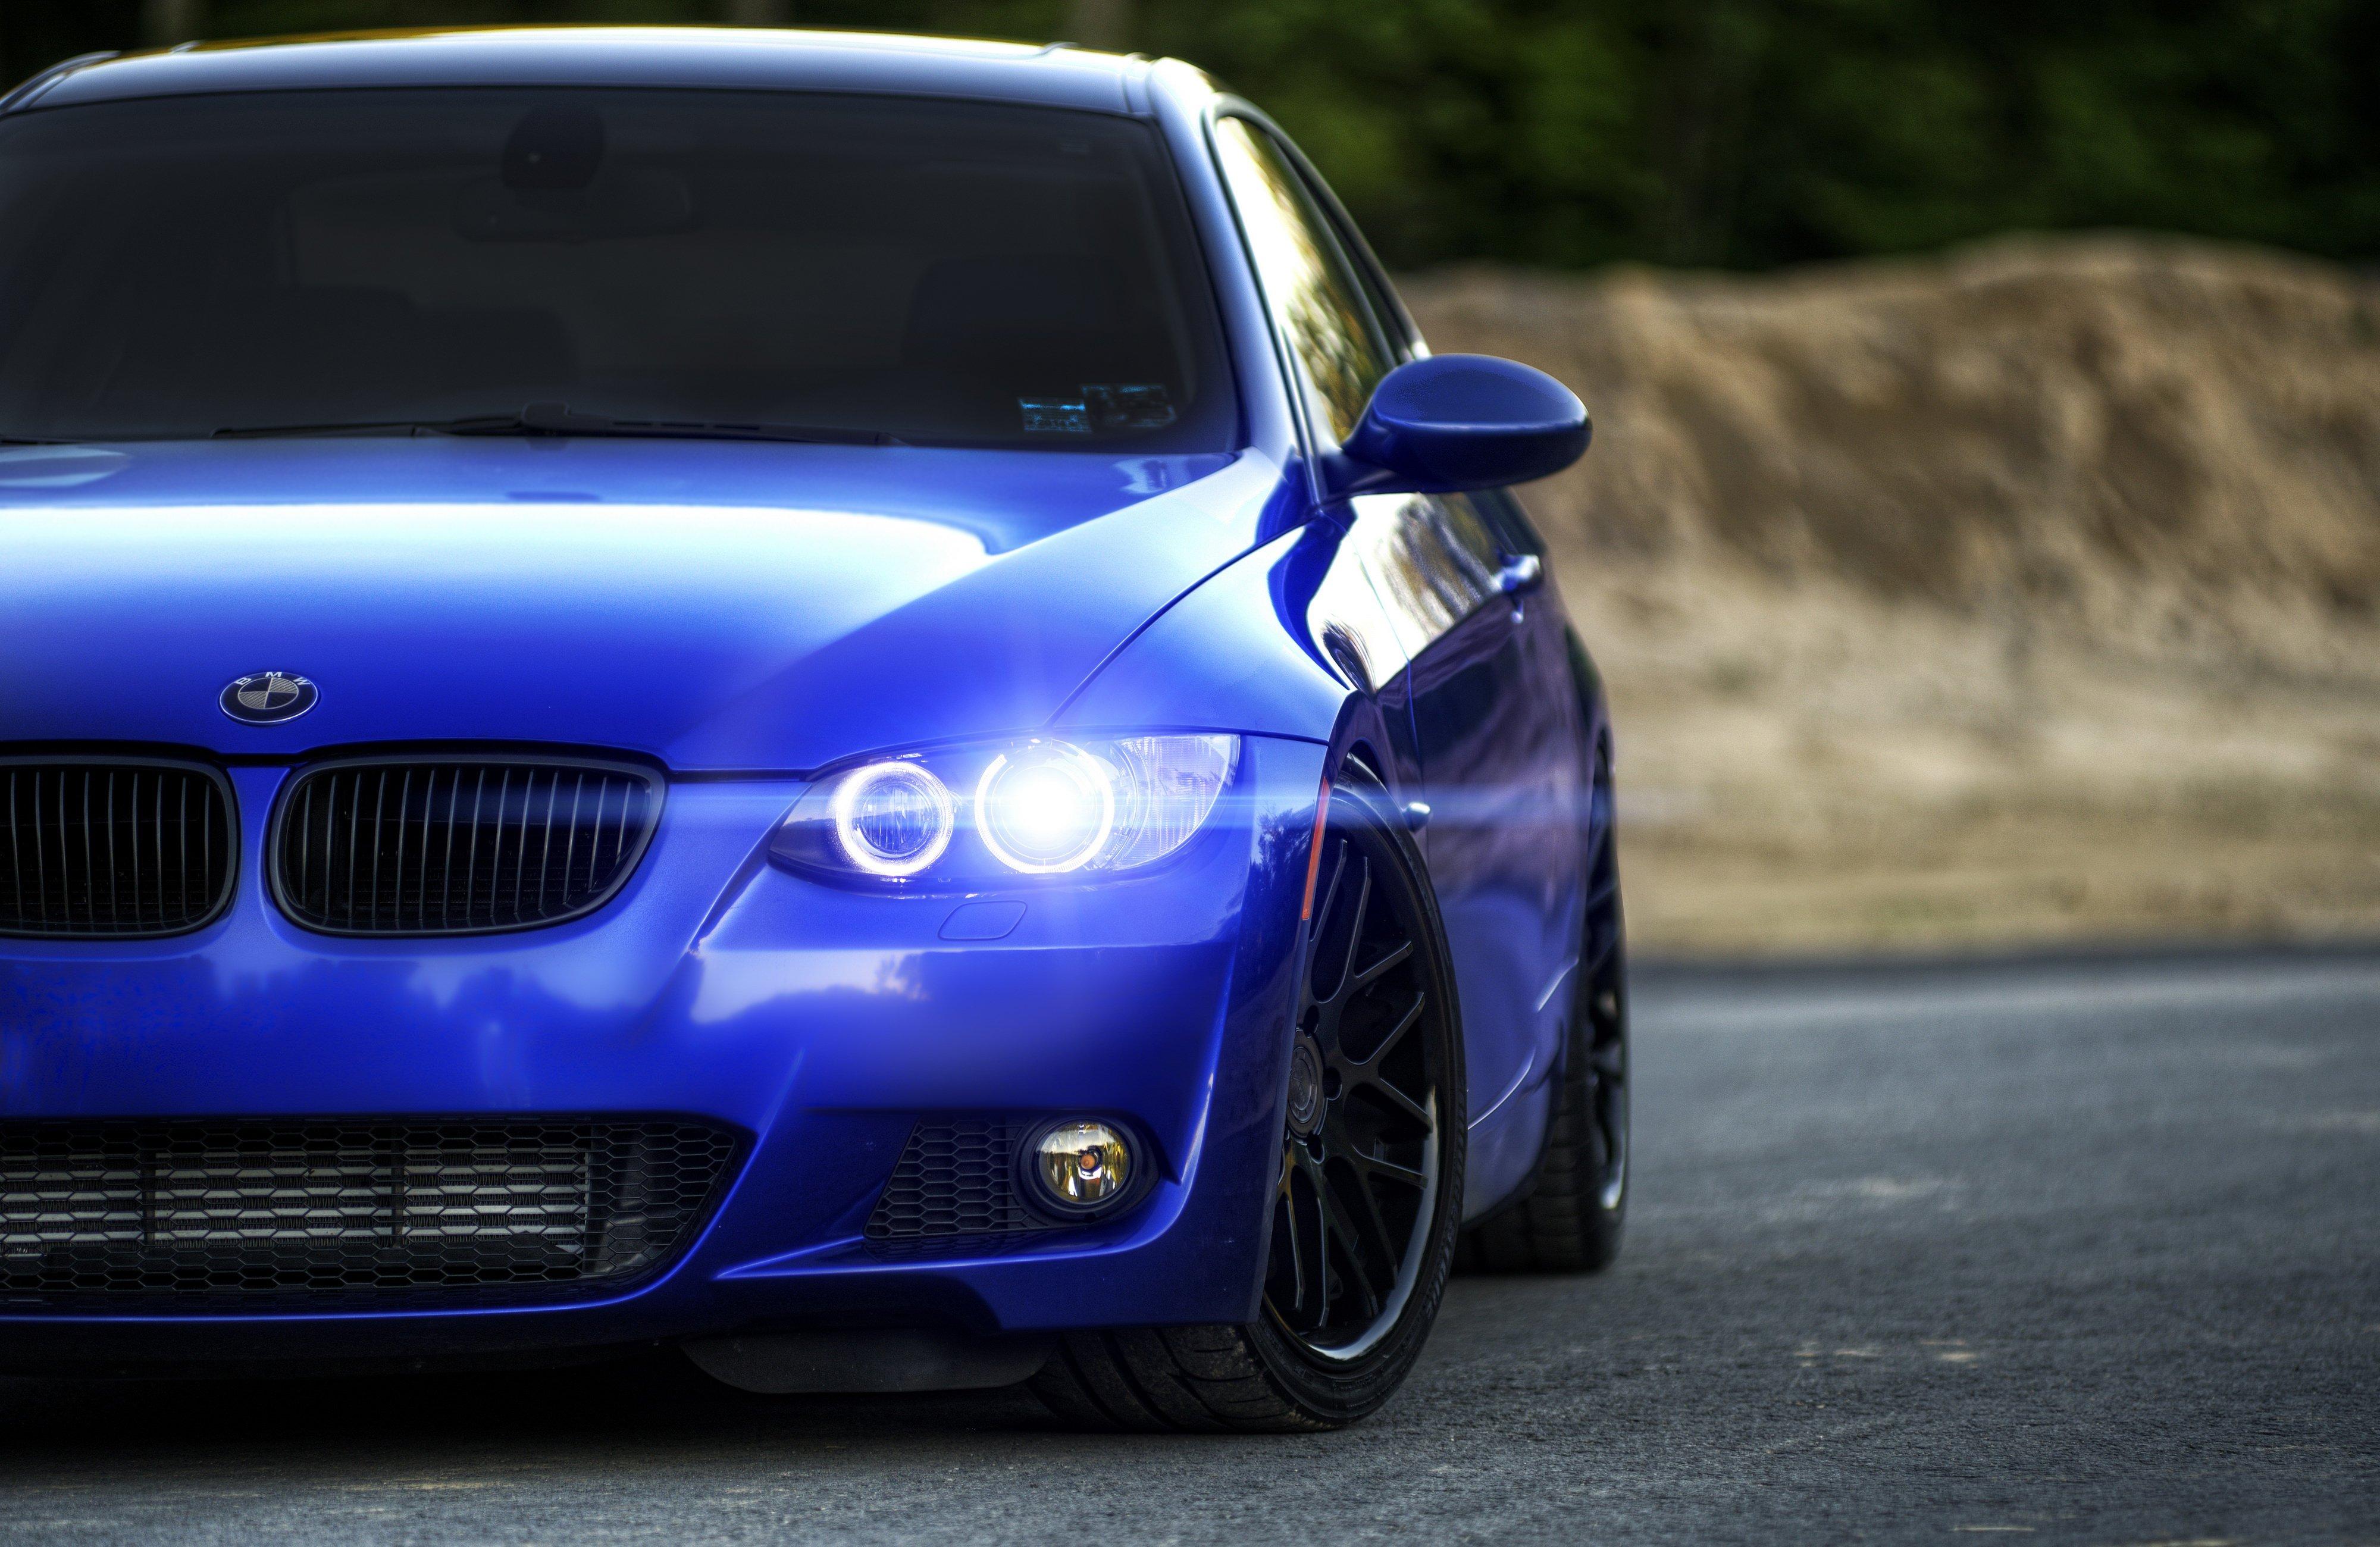 1920x1200 Car Bmw Rims Blurred Blue Cars Wallpapers Blur Background With Car 1920x1200 Wallpaper Teahub Io